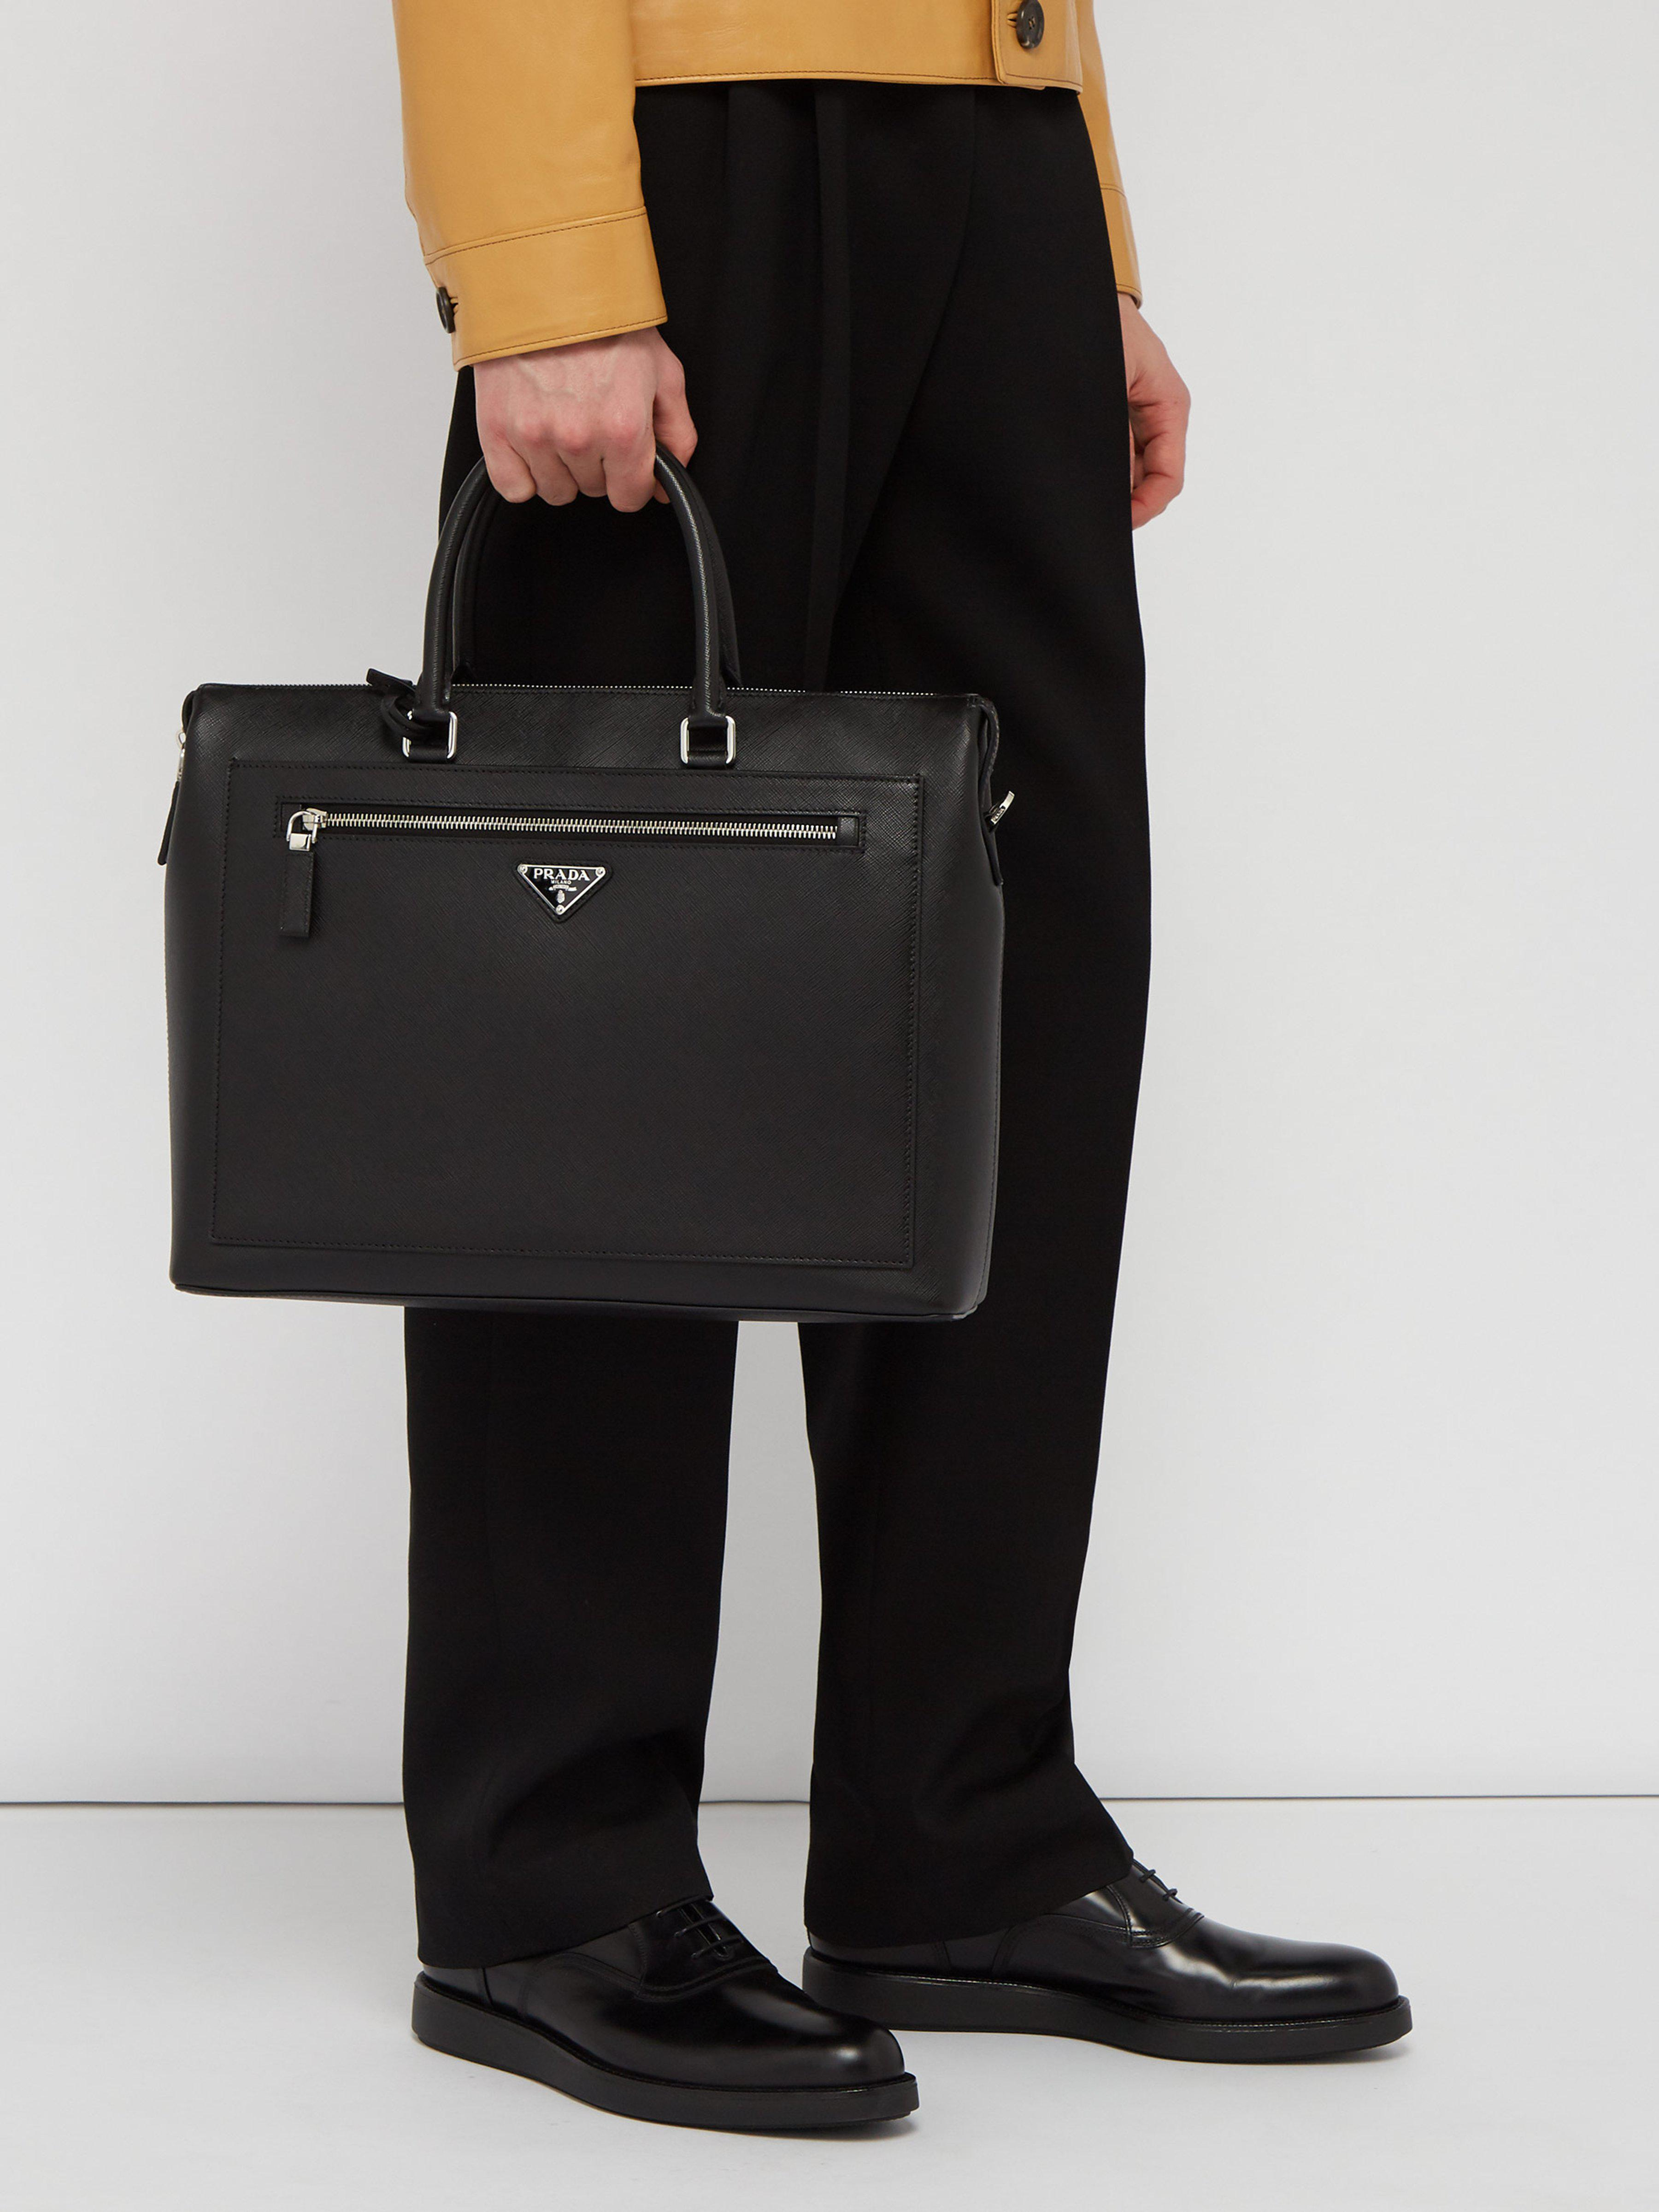 aeed2e82a411 Prada Saffiano Leather Briefcase in Black for Men - Lyst